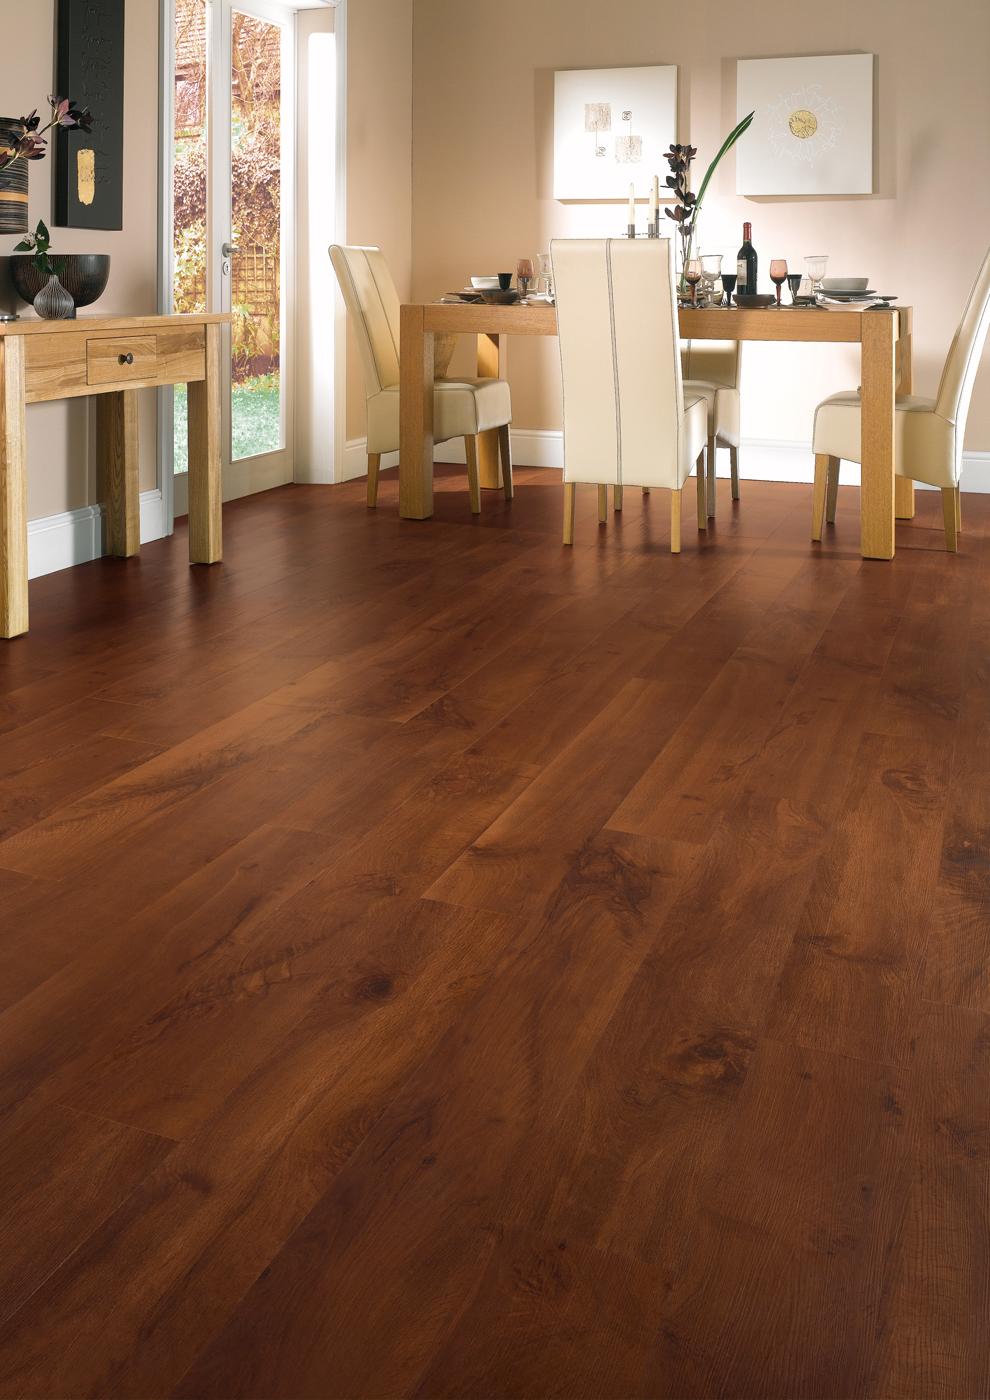 Van Gogh 187 Carpet Fitter And Floor Layer Nottingham